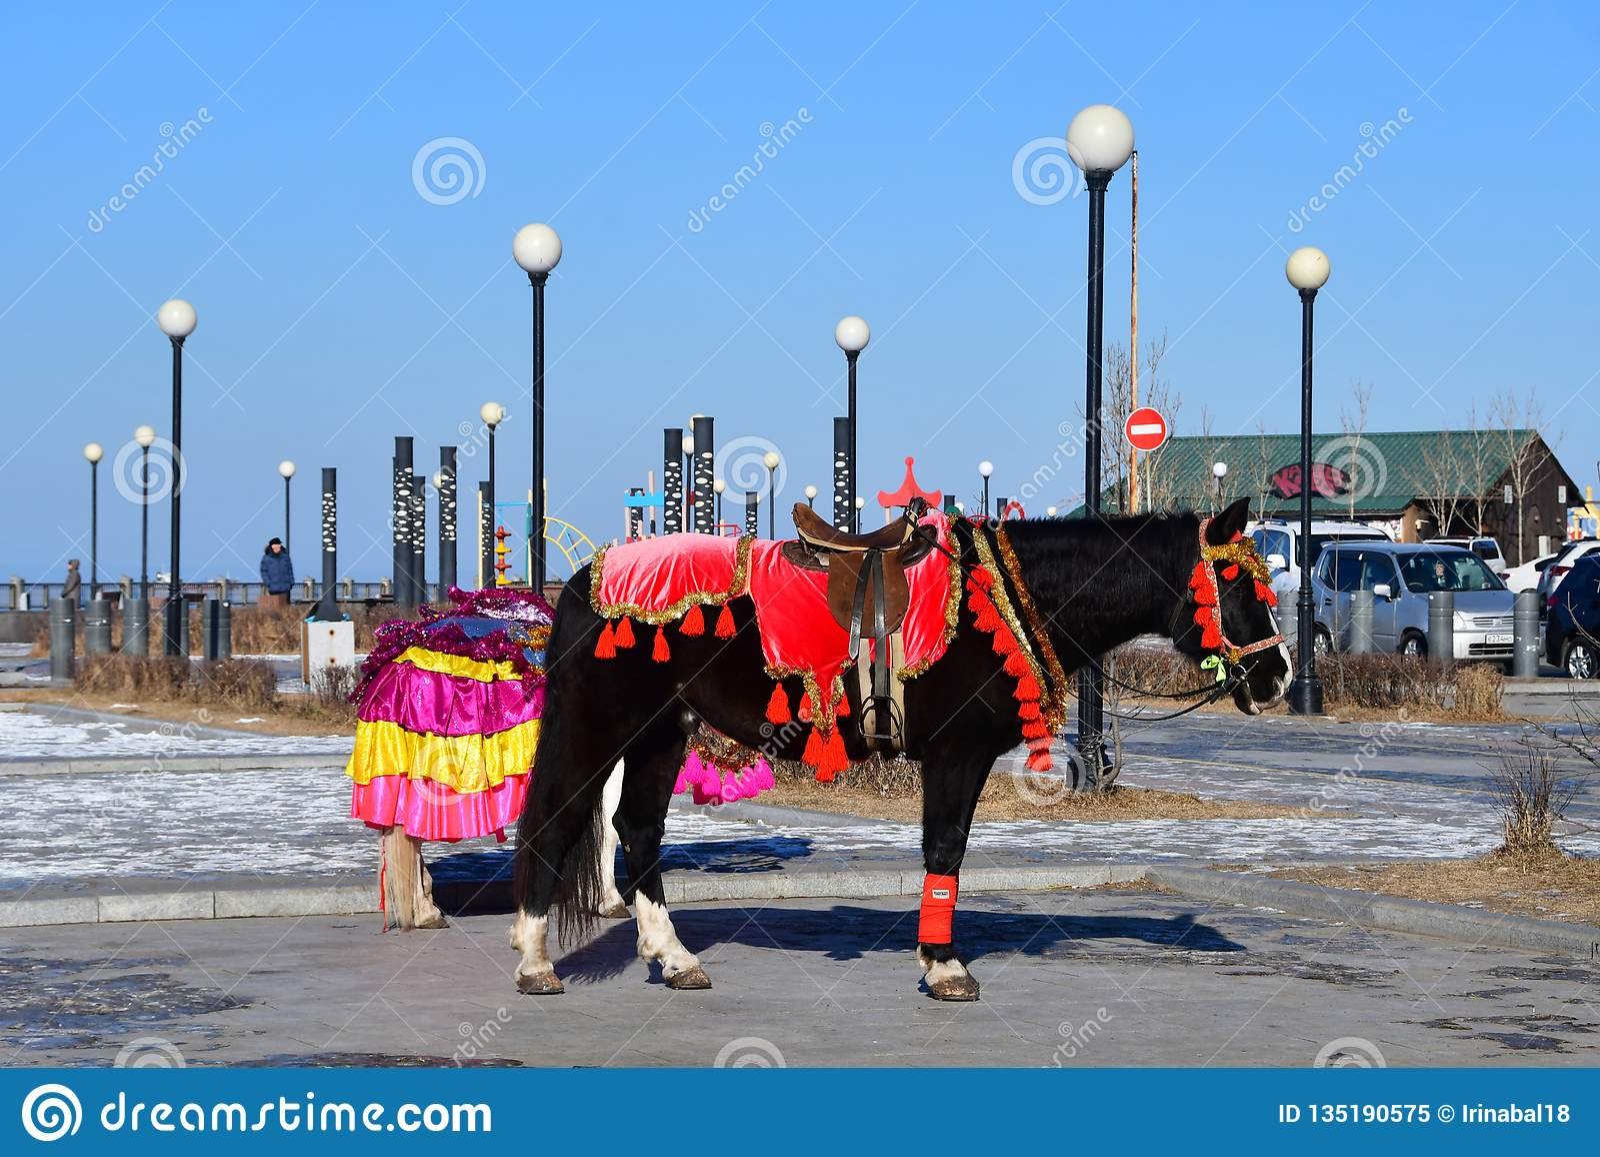 Vladivostok Horse